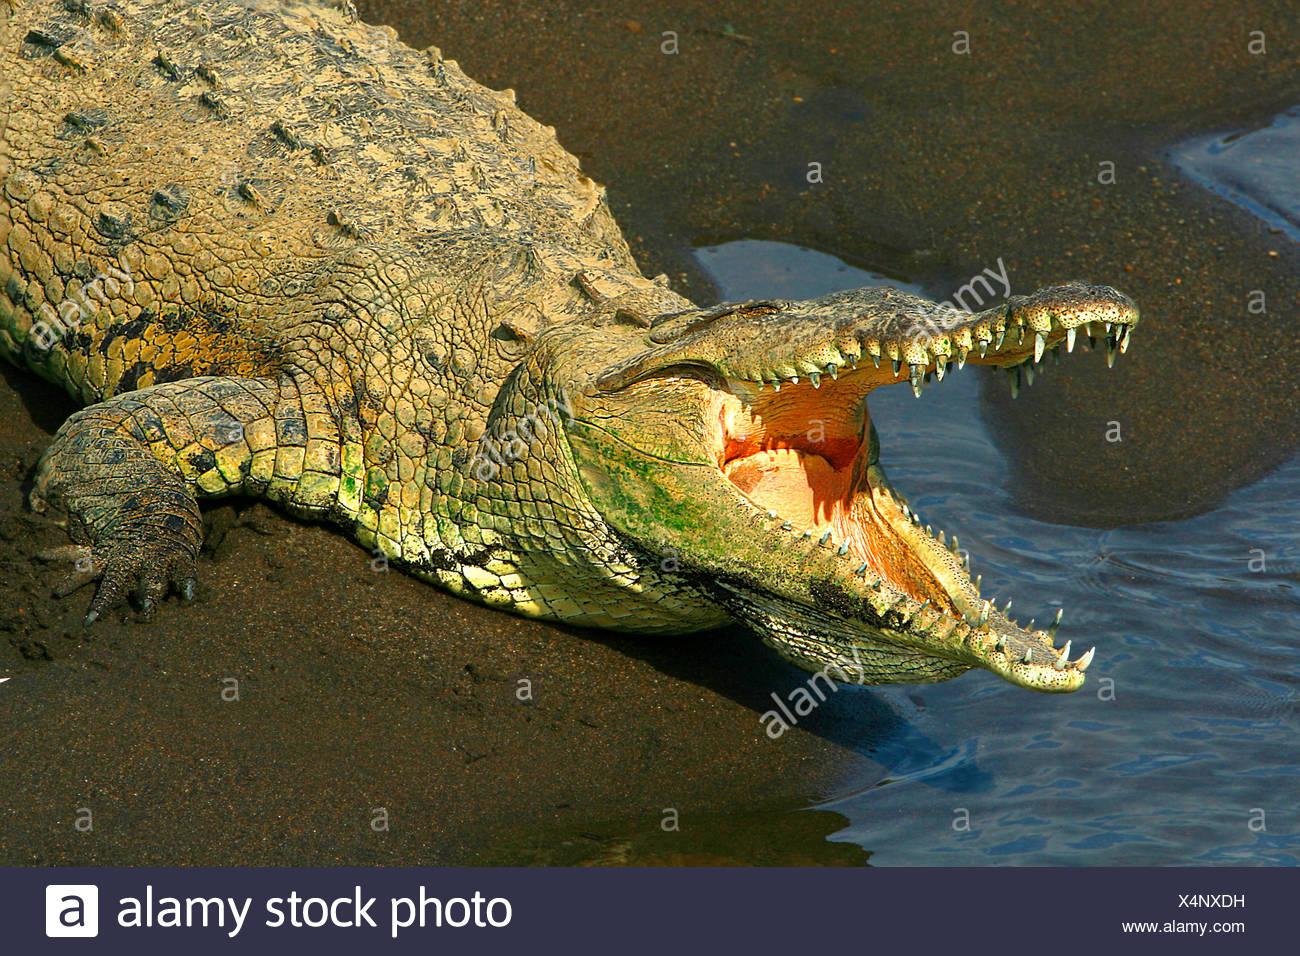 Spitzkrokodil, Spitz-Krokodil (Crocodylus acutus), sonnt